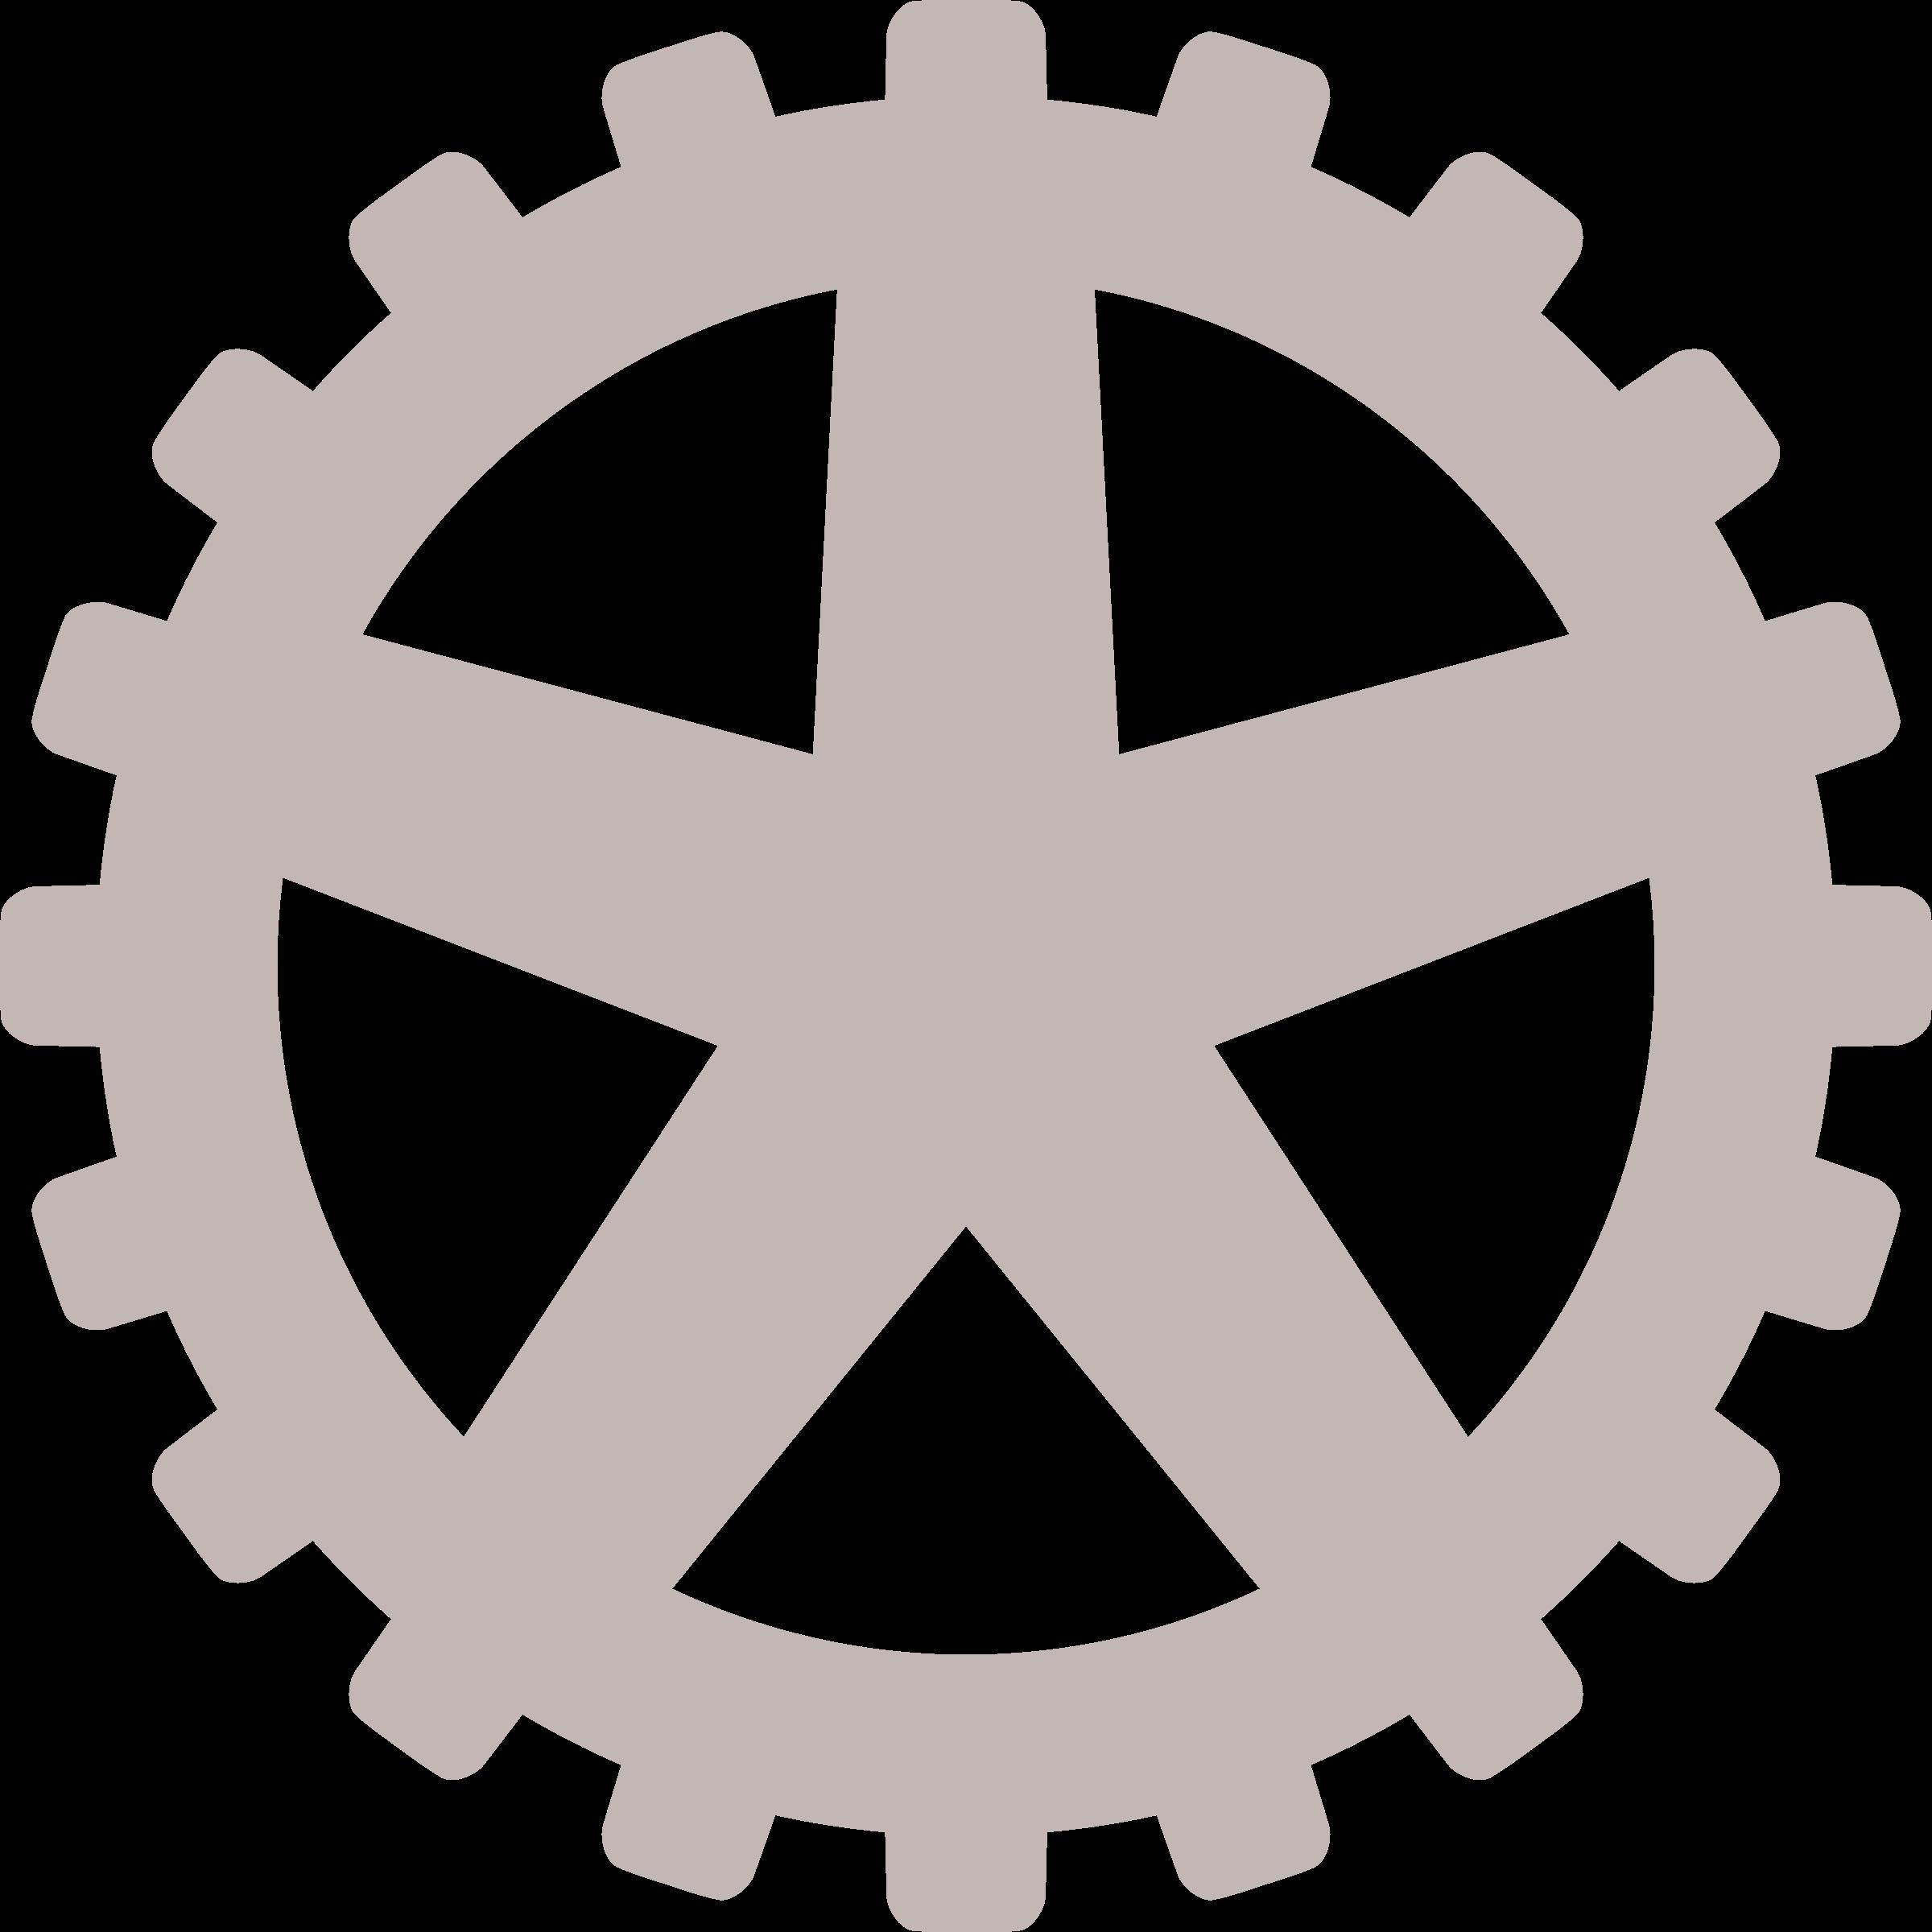 Wheel clipart engineer. Gear big image png